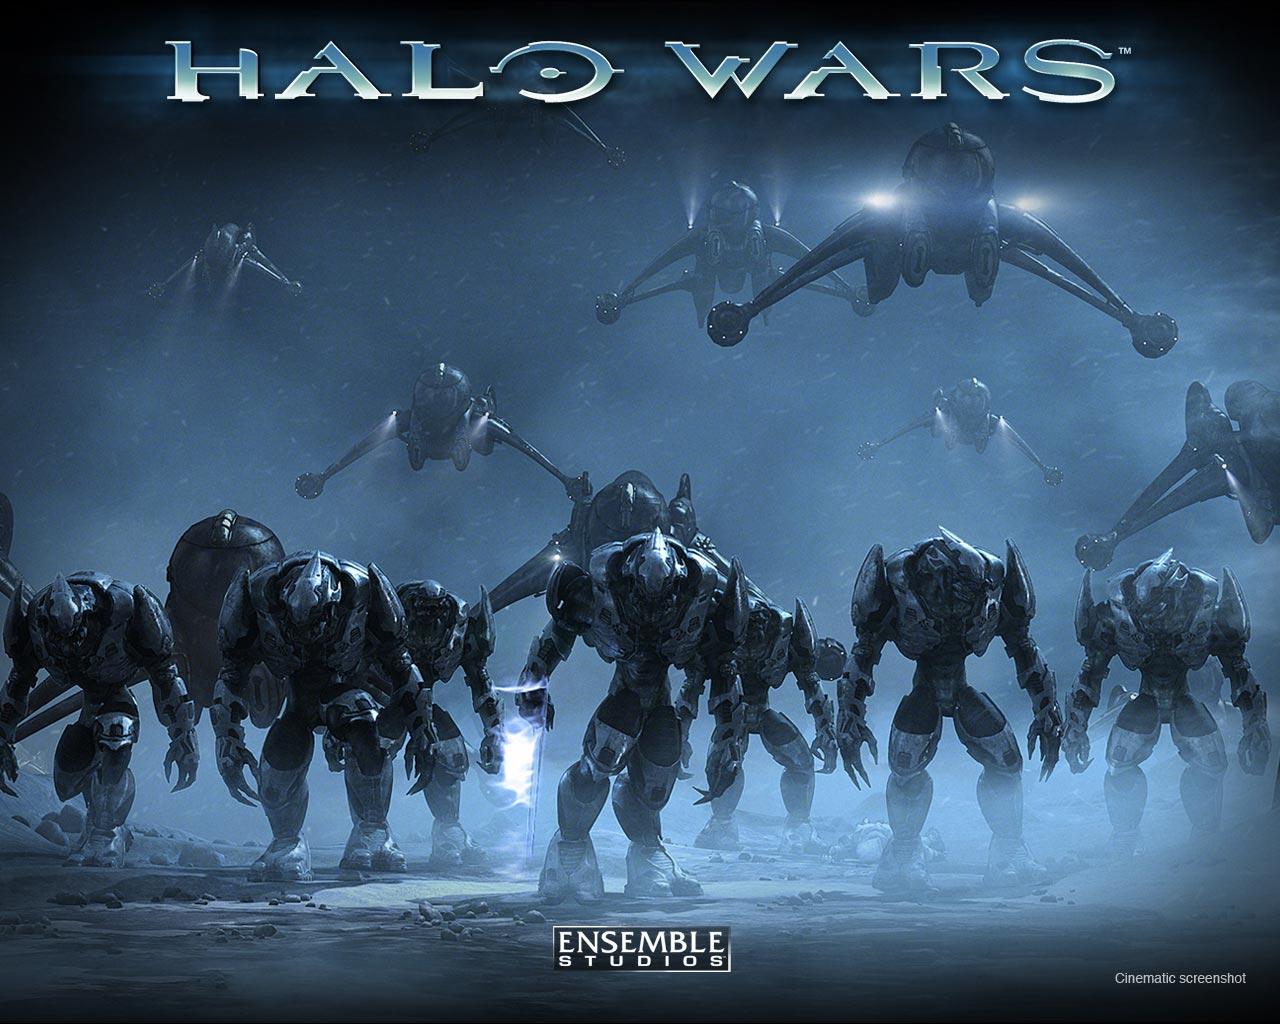 Halo Wars Arbiter Wallpaper 5042 Hd Wallpapers in Games   Imagescicom 1280x1024